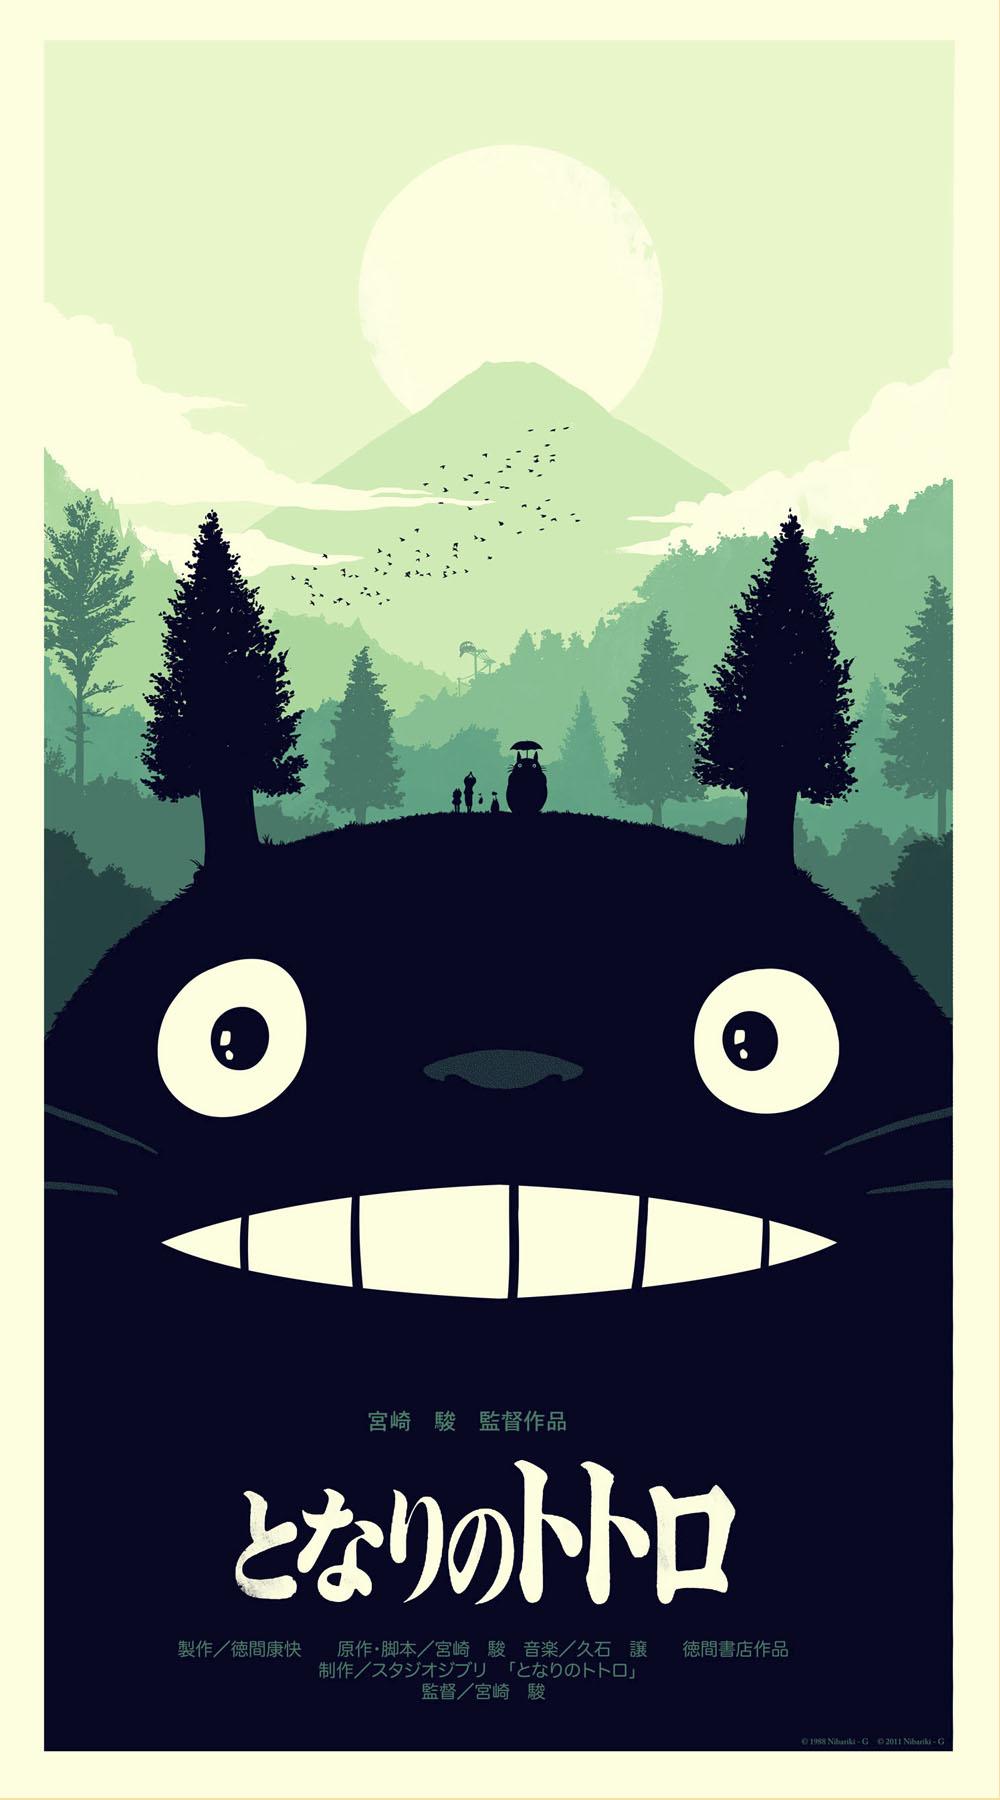 Totoro Illustrated Movie Poster